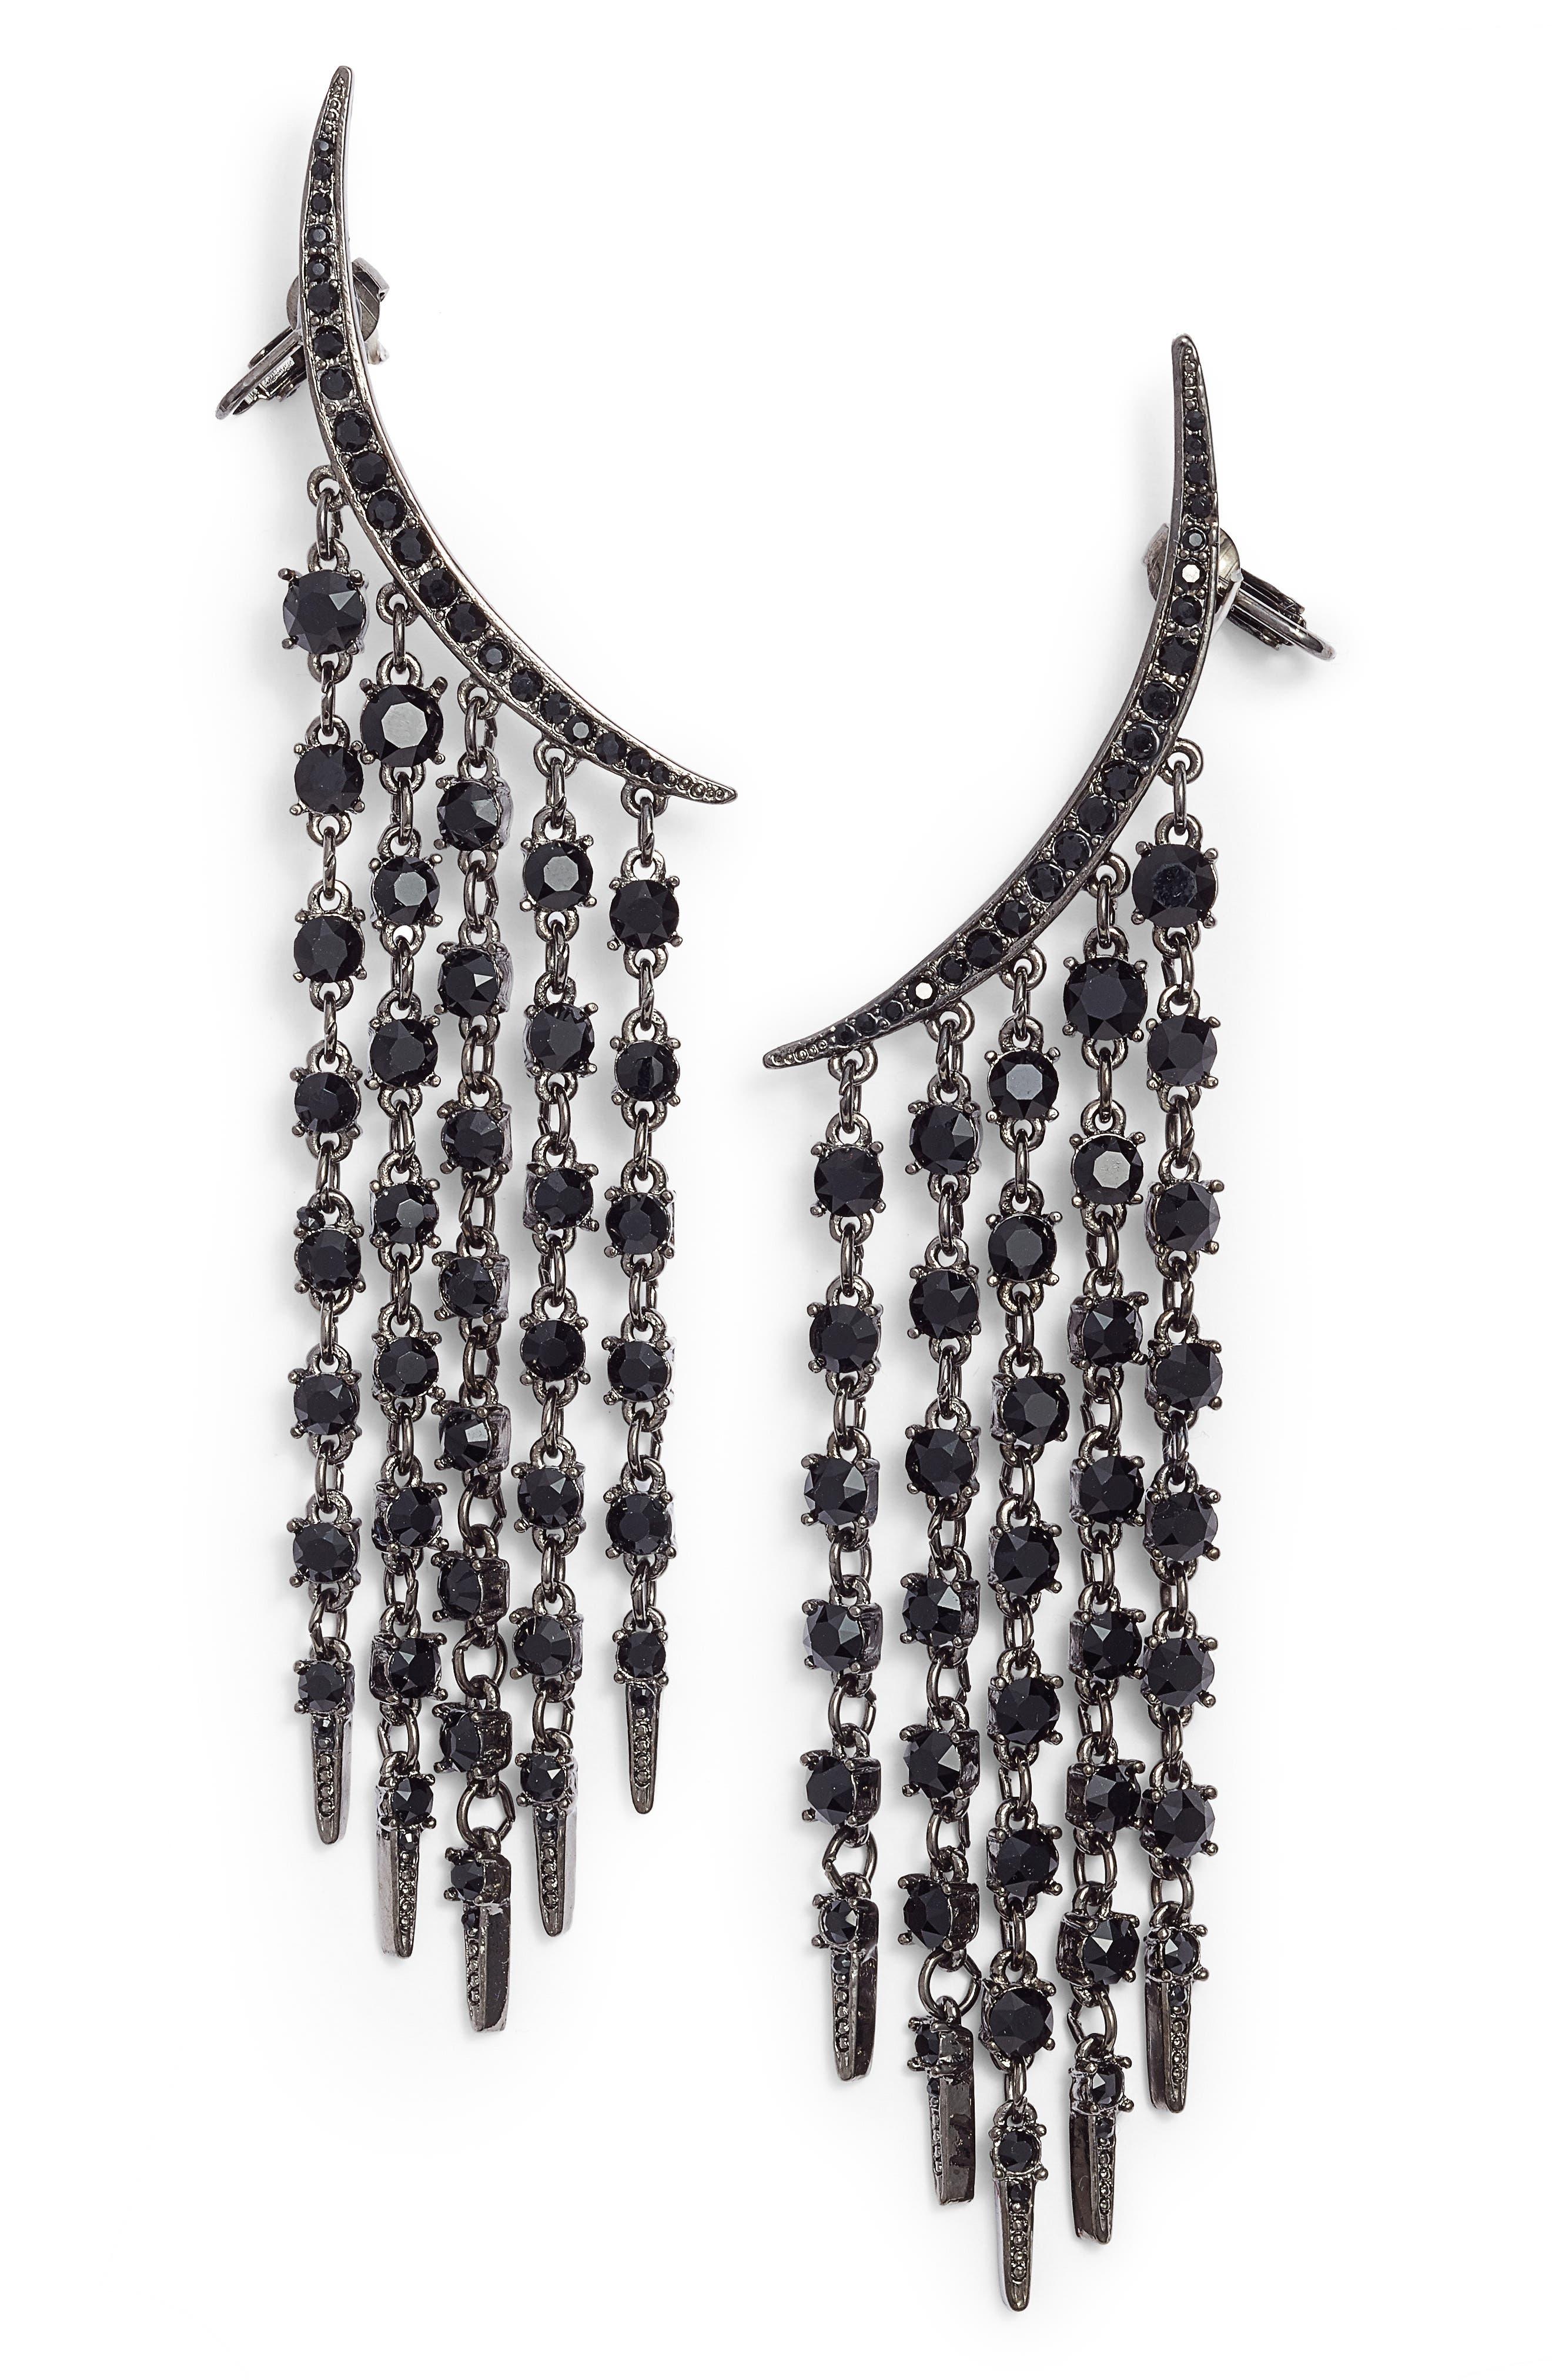 Tendril Crystal Earrings,                             Main thumbnail 1, color,                             001